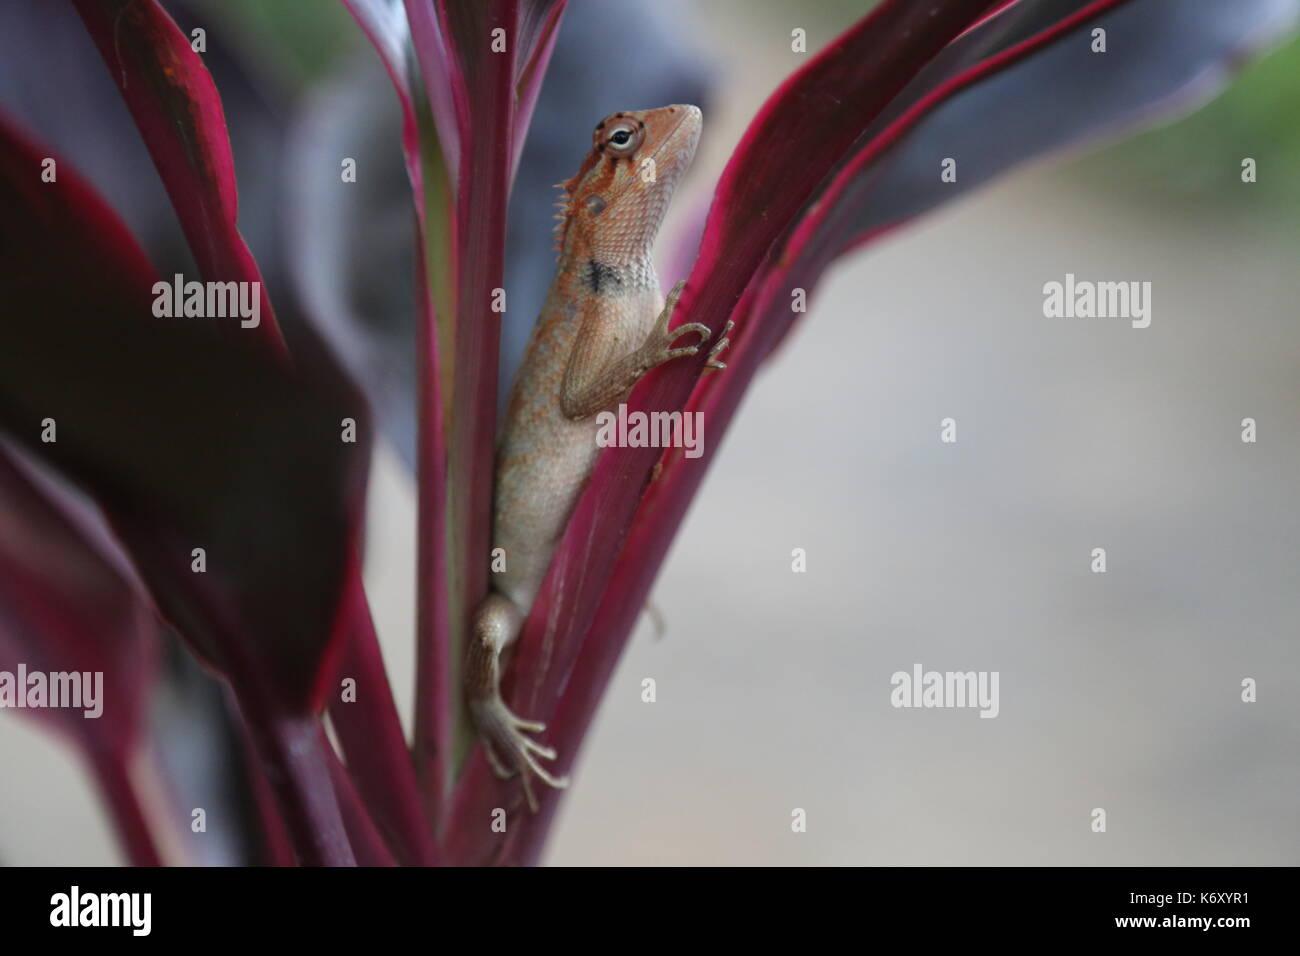 Sri Lankan Kangaroo Lizard (Otocryptis Wiegmanni) in Sri lanka - Stock Image